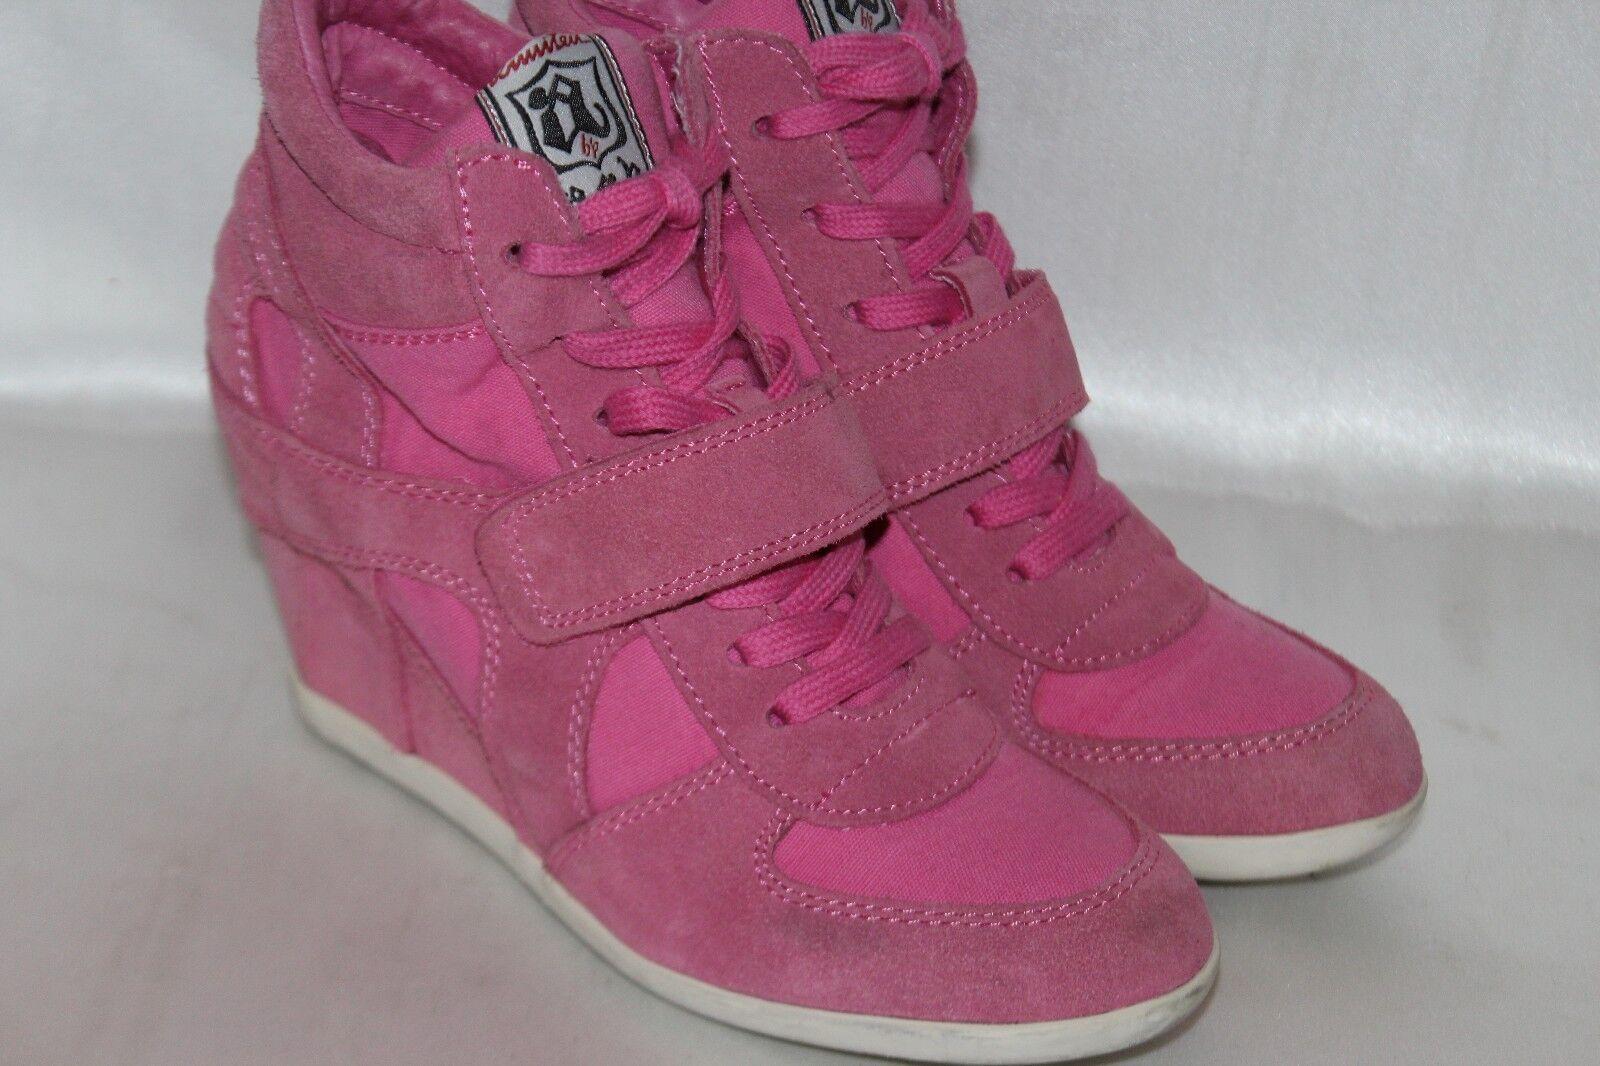 ASH Limited Pink Suede Leather BOWIE High Hi Top Hidden Wedge Sneaker Sz 8 EU39